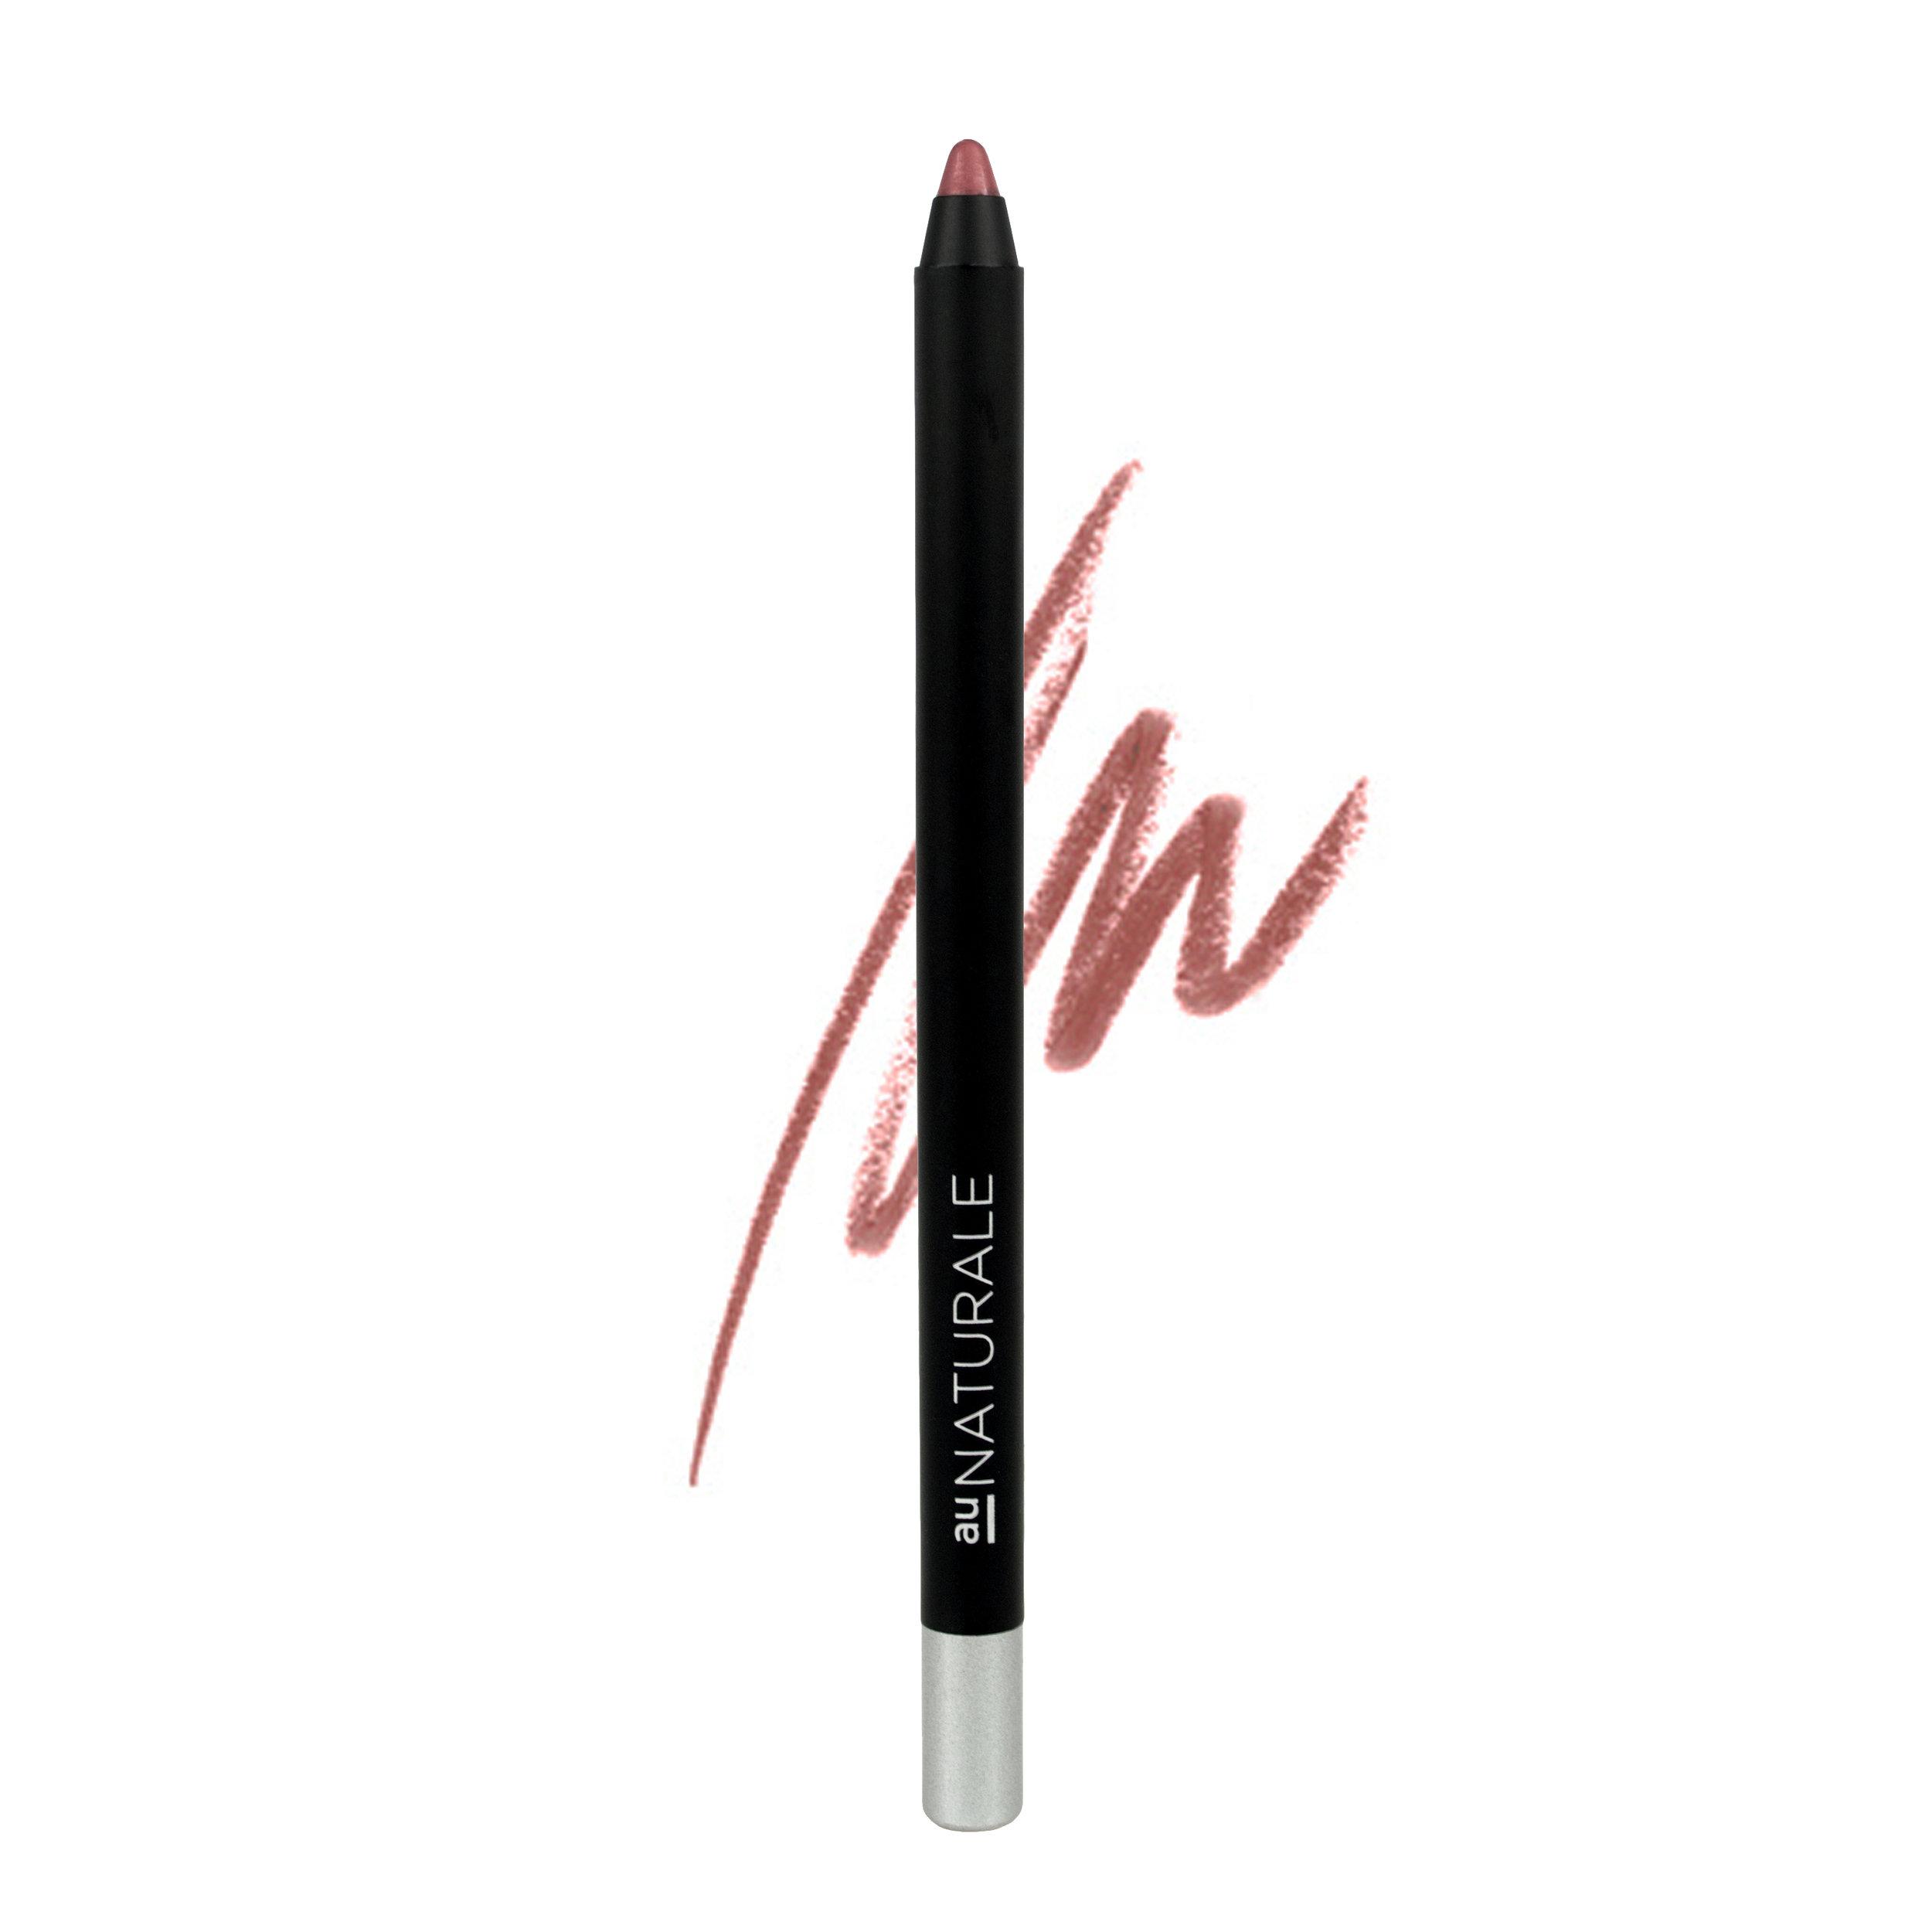 Slipper Perfect Match Lip Pencil